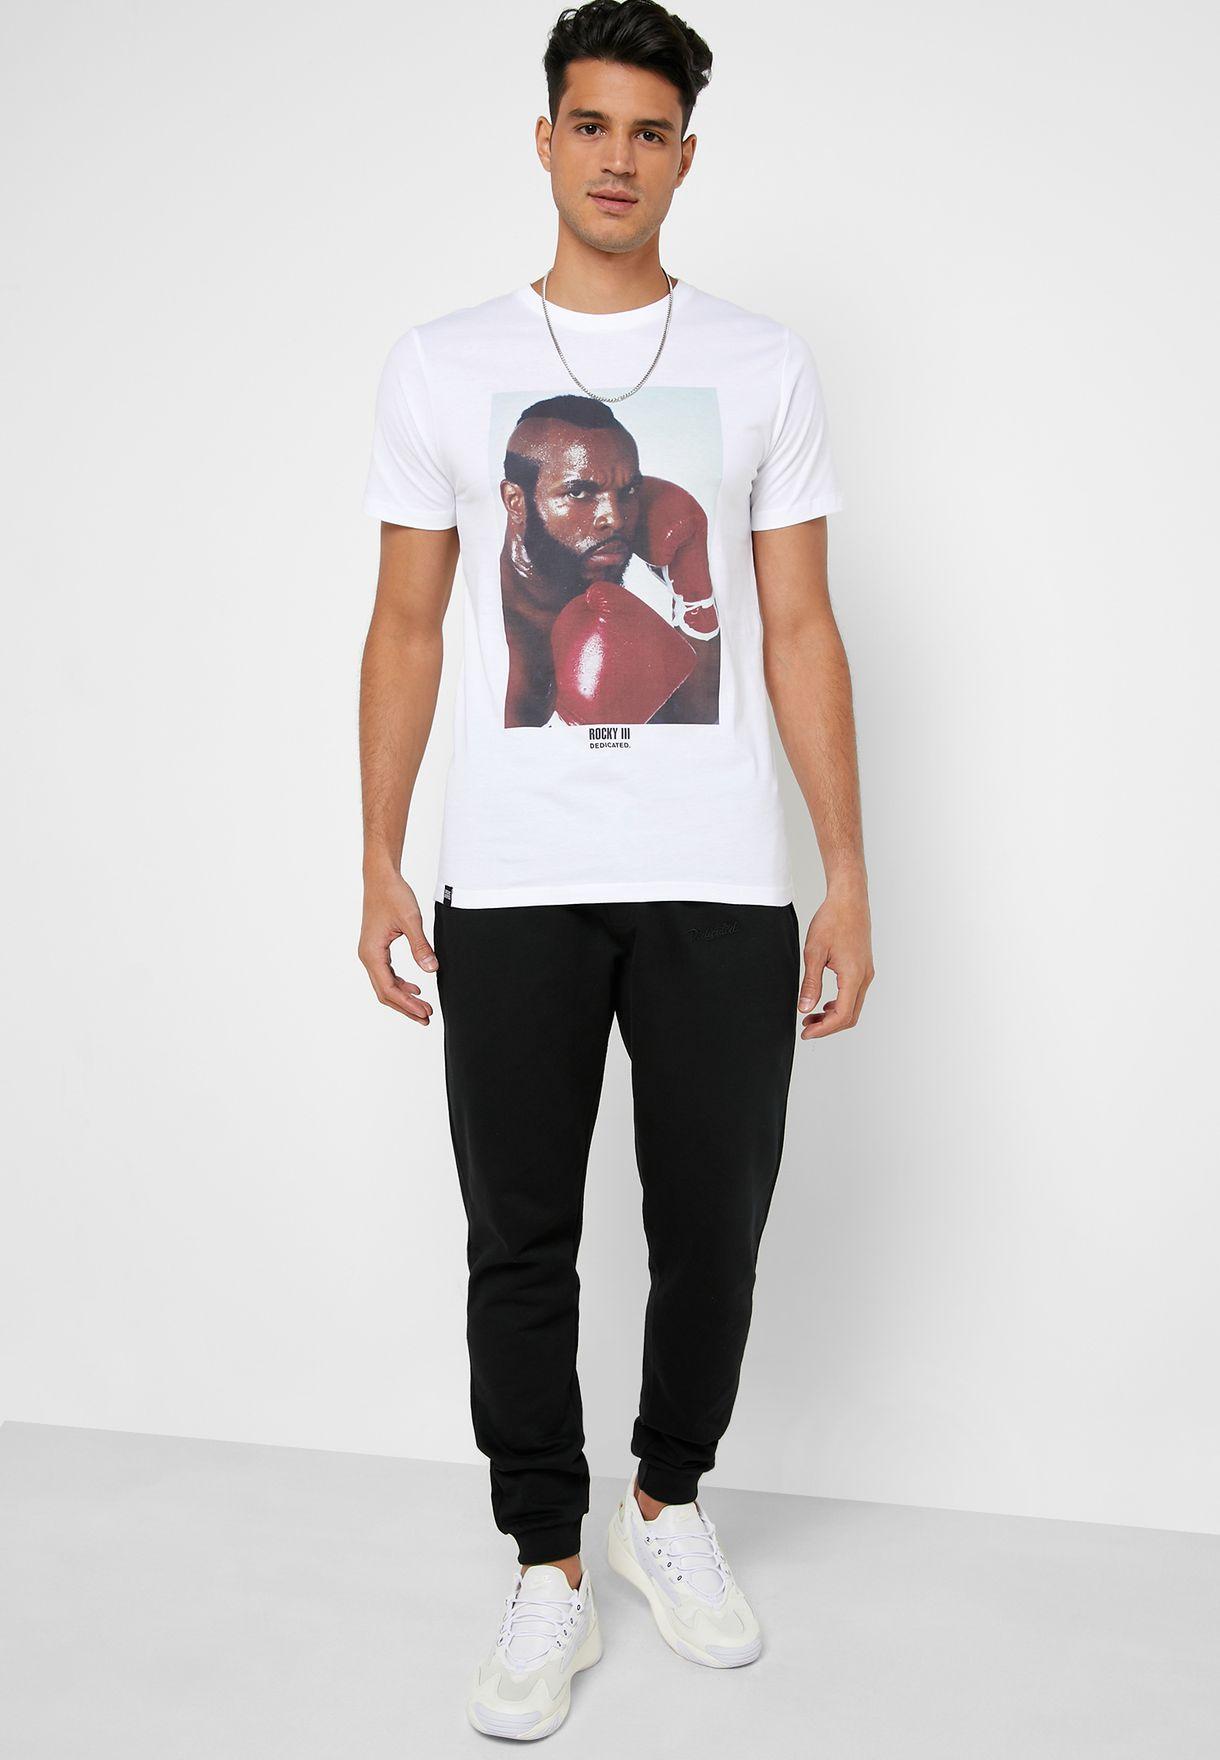 Stockholm Clubber Lang Crew Neck T-Shirt